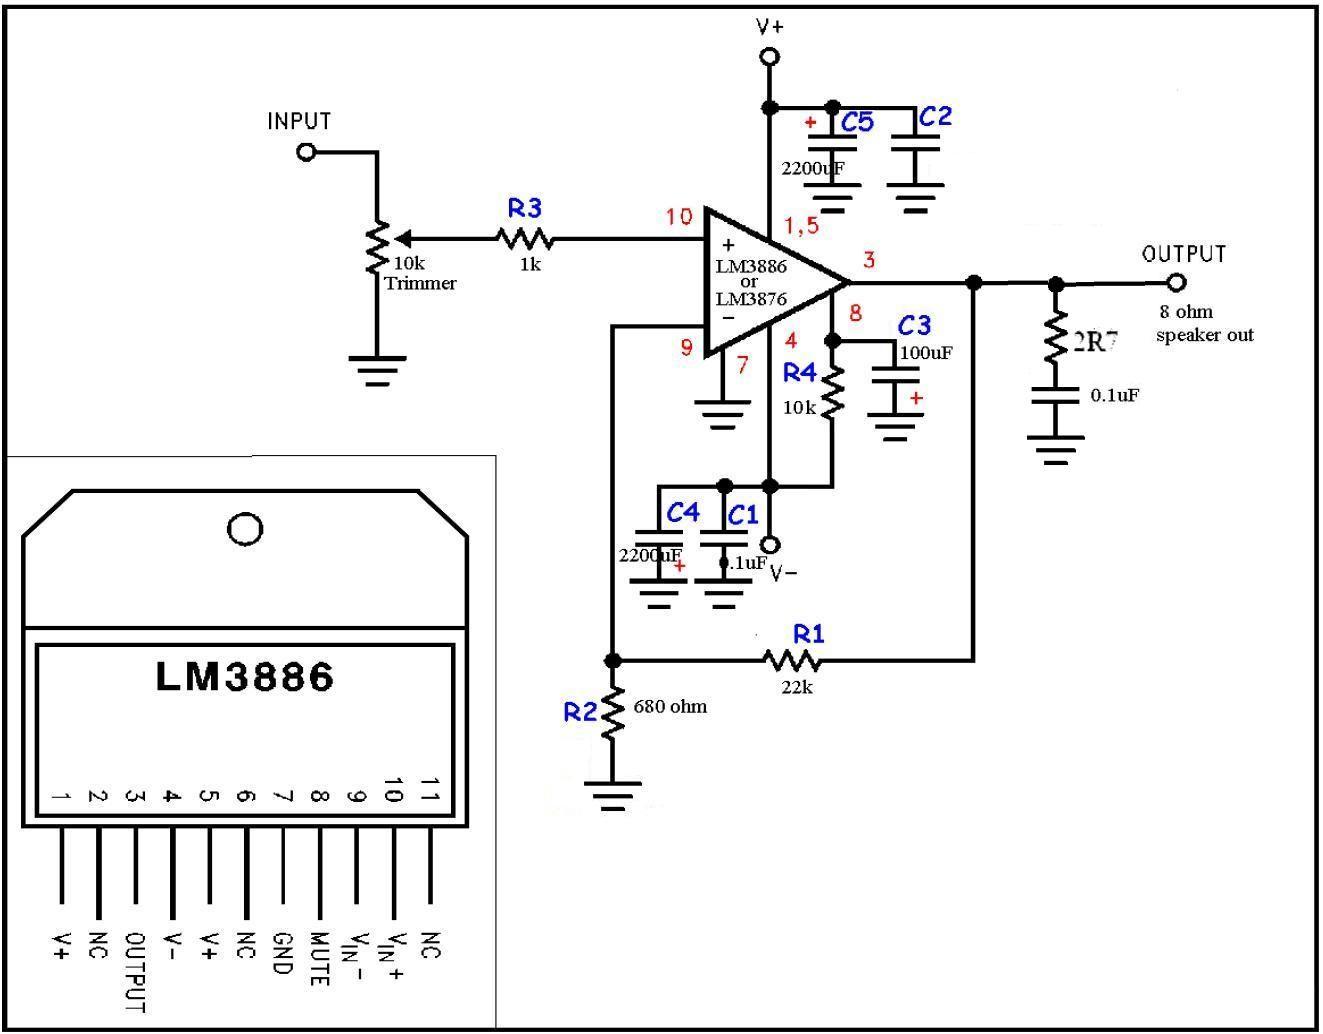 lm3886 amplifier gainclone